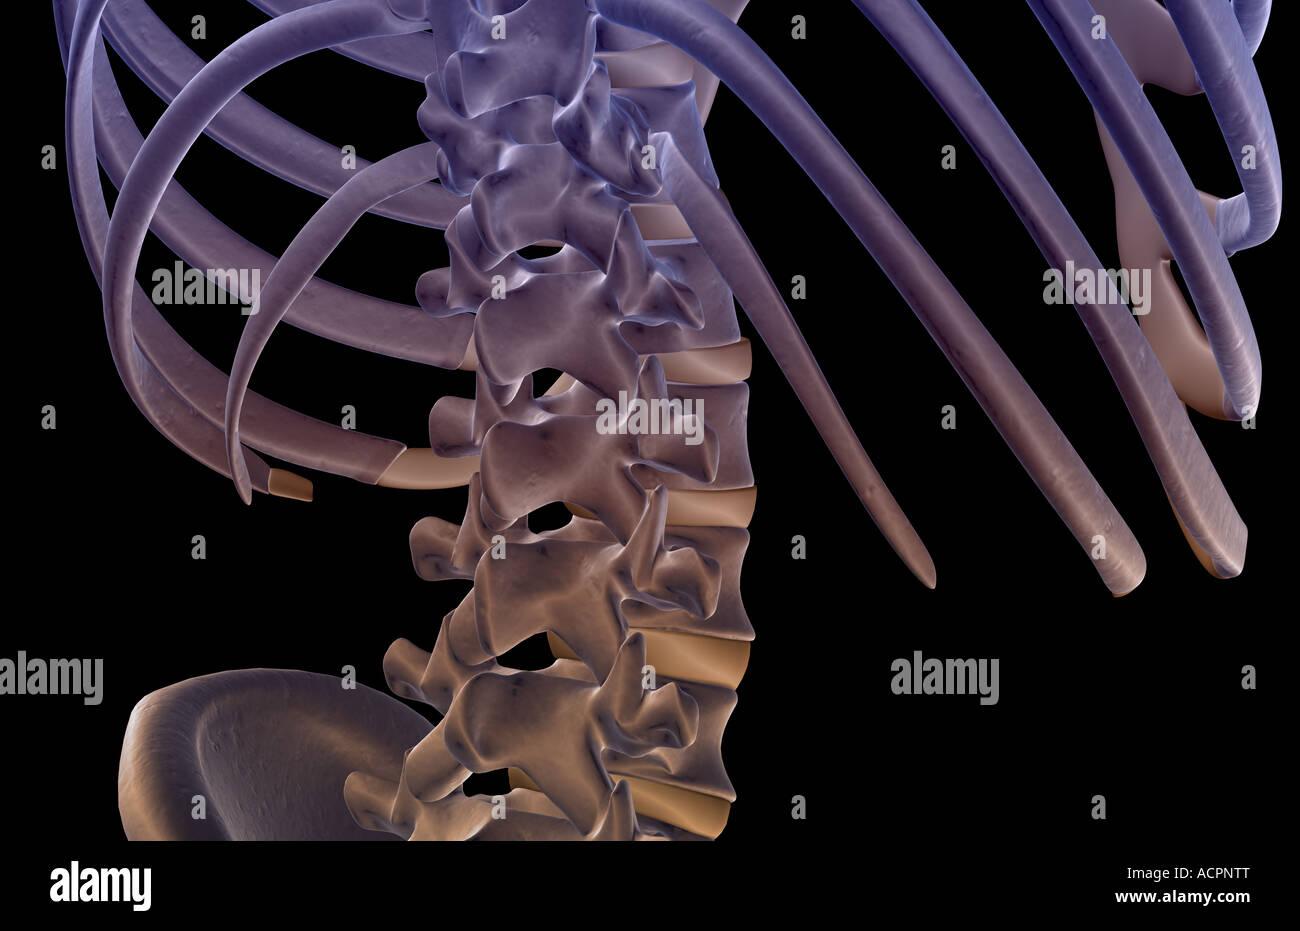 Lower Back Bone Stock Photos Lower Back Bone Stock Images Alamy